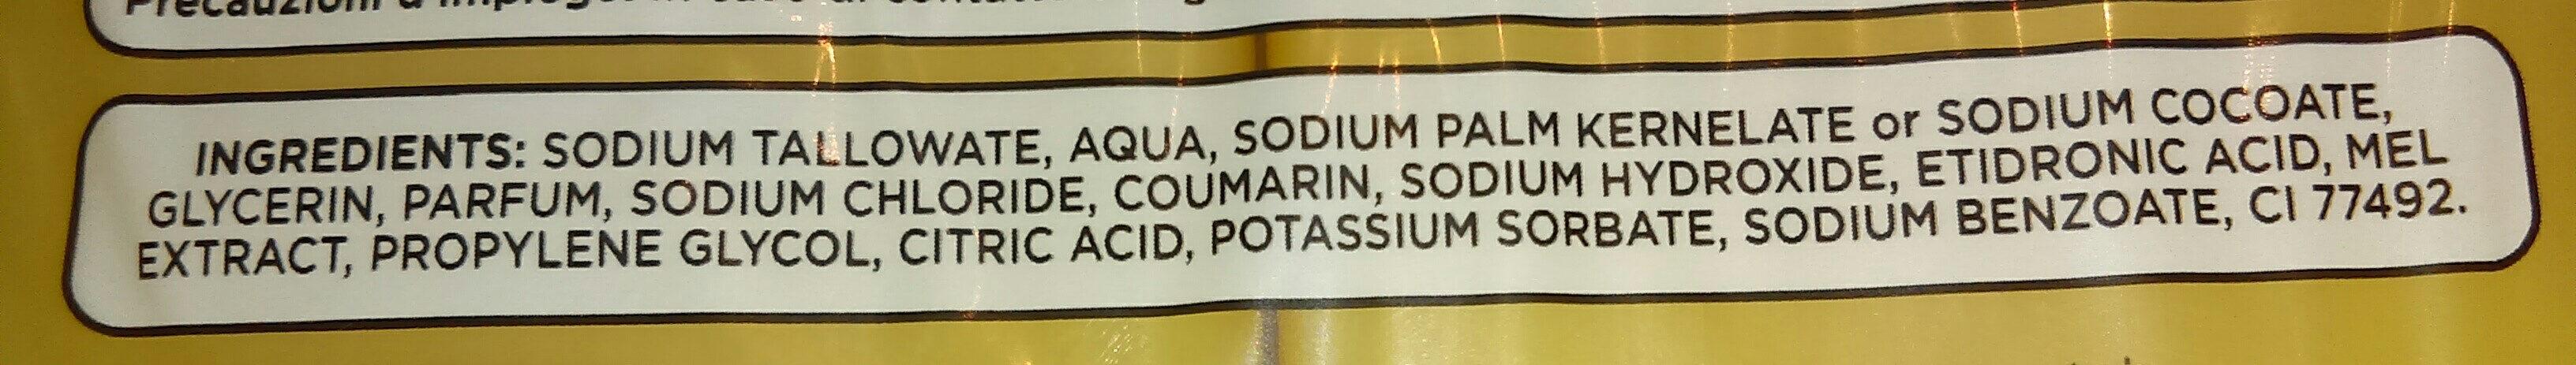 savon de Marseille parfum miel - Ingrédients